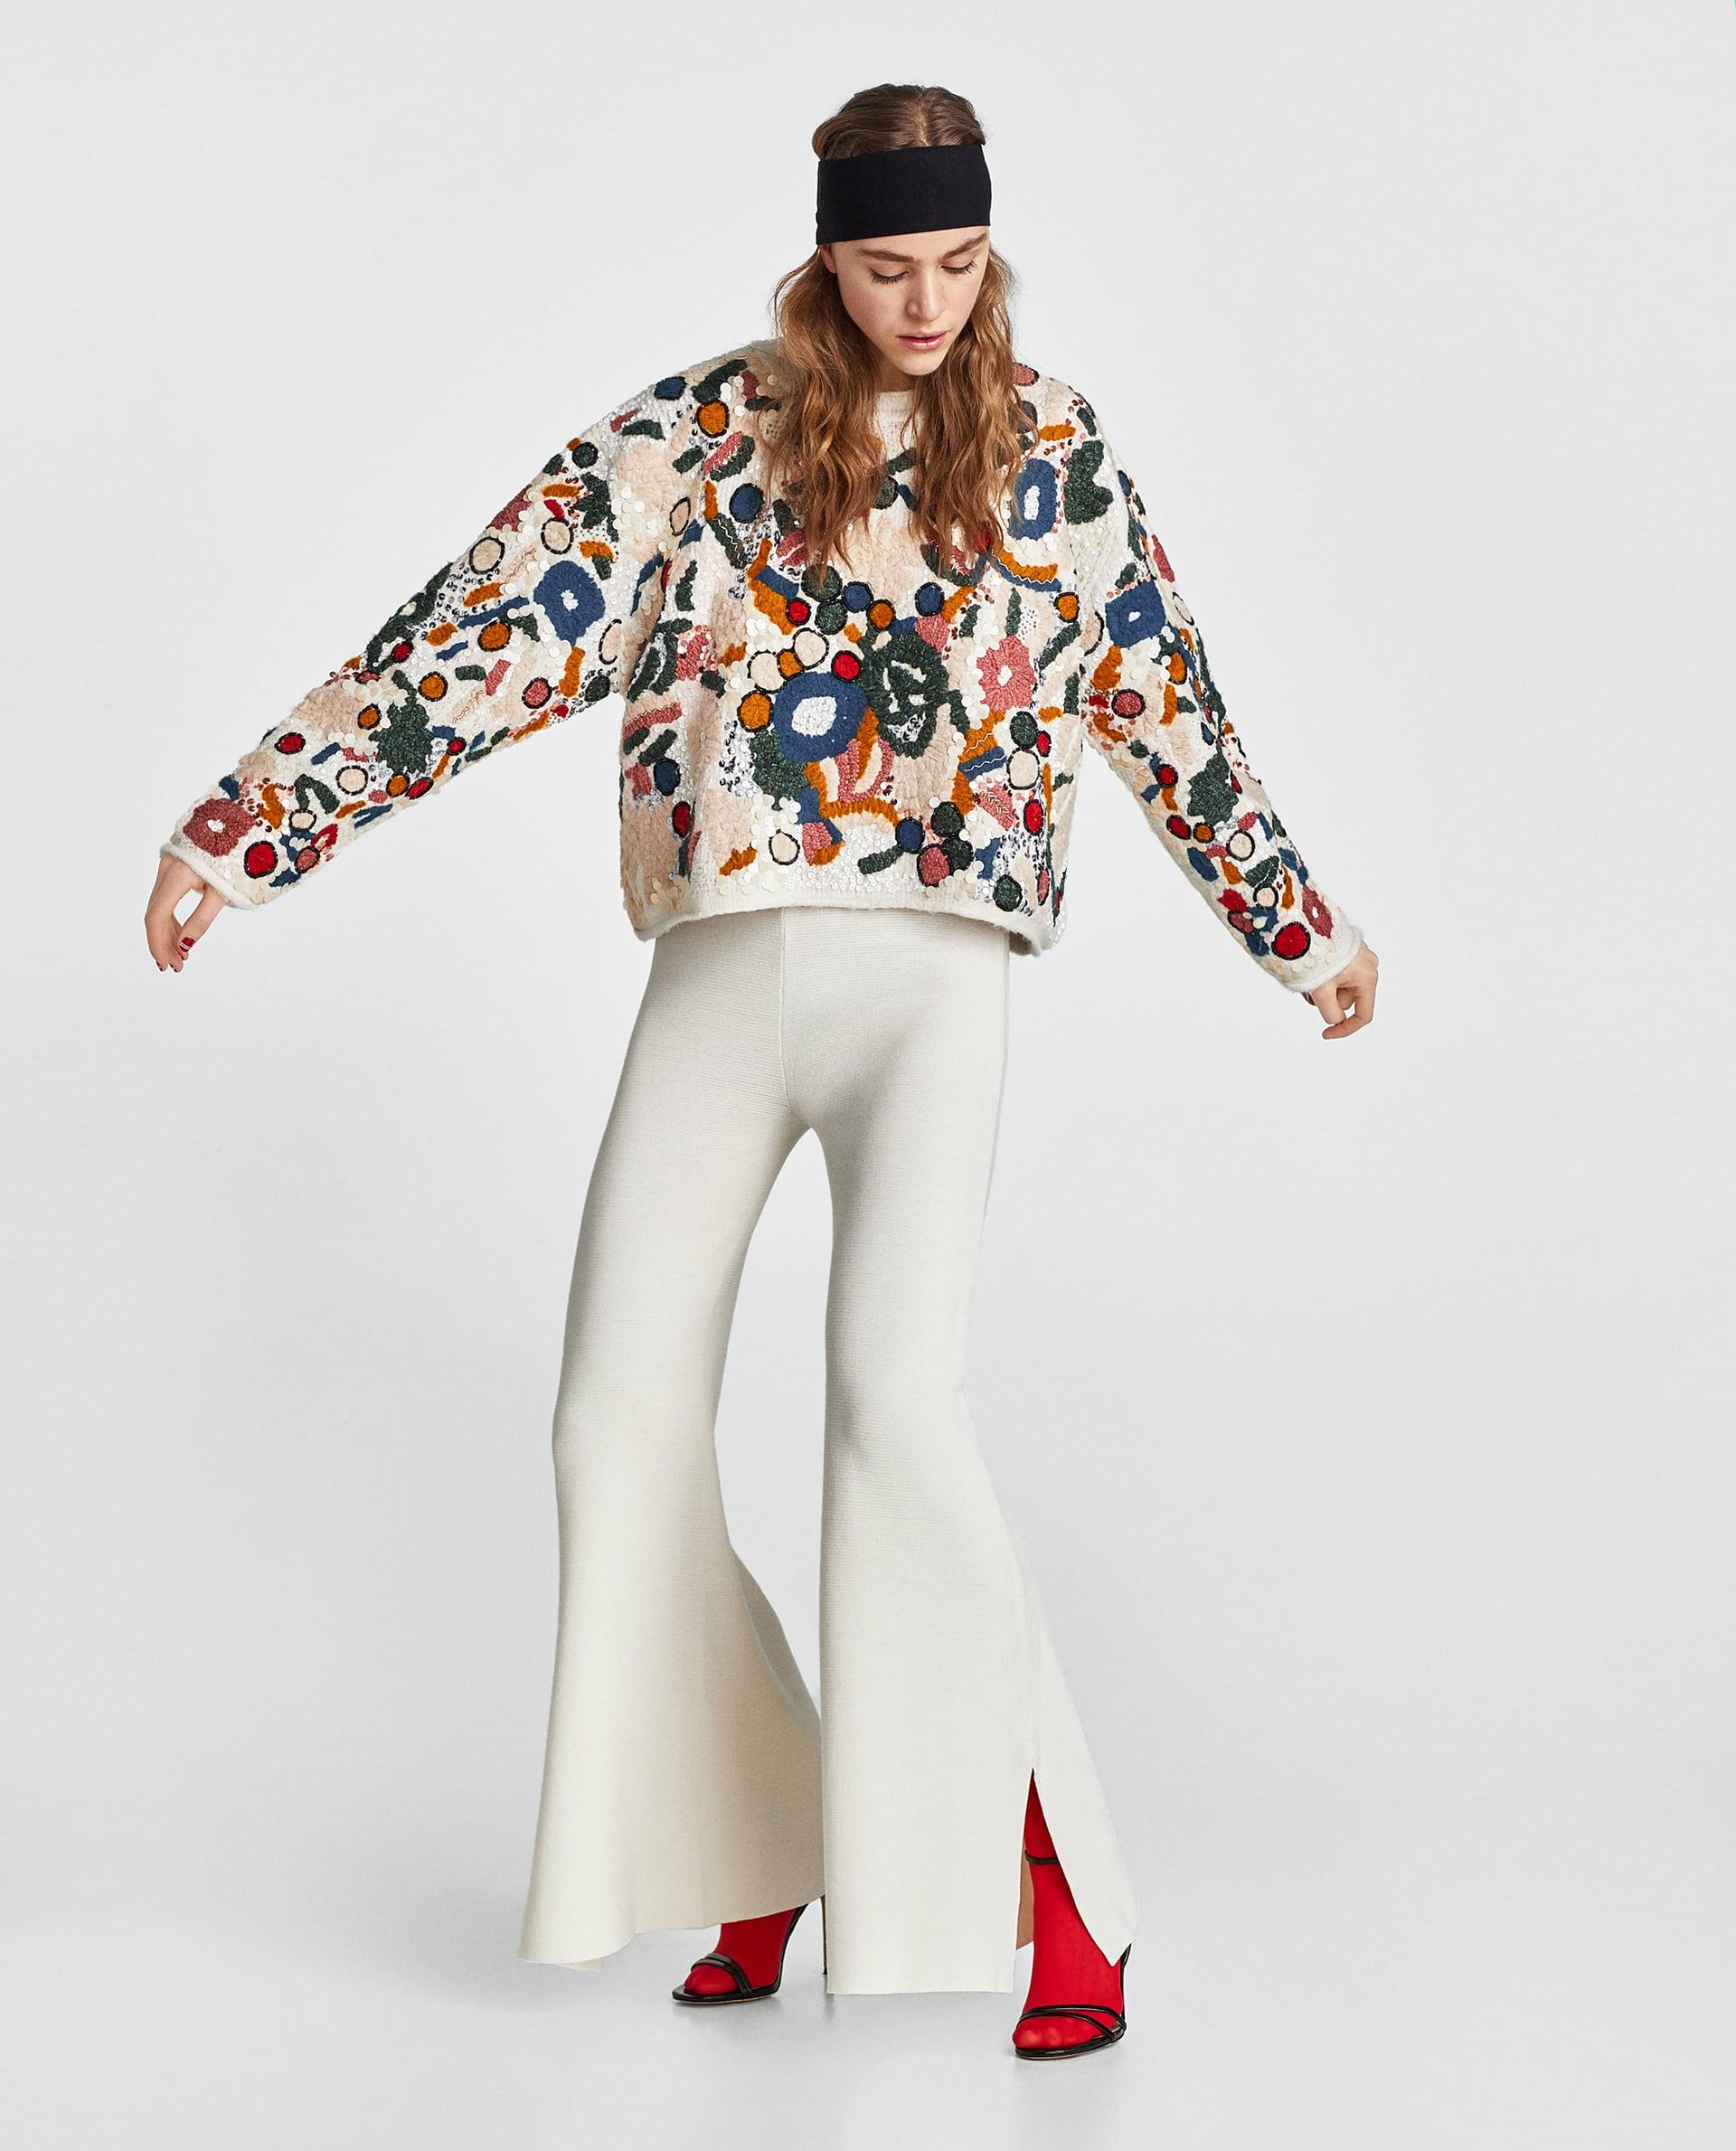 Pantaloni a zampa bianchi Zara collezione primavera estate 2018